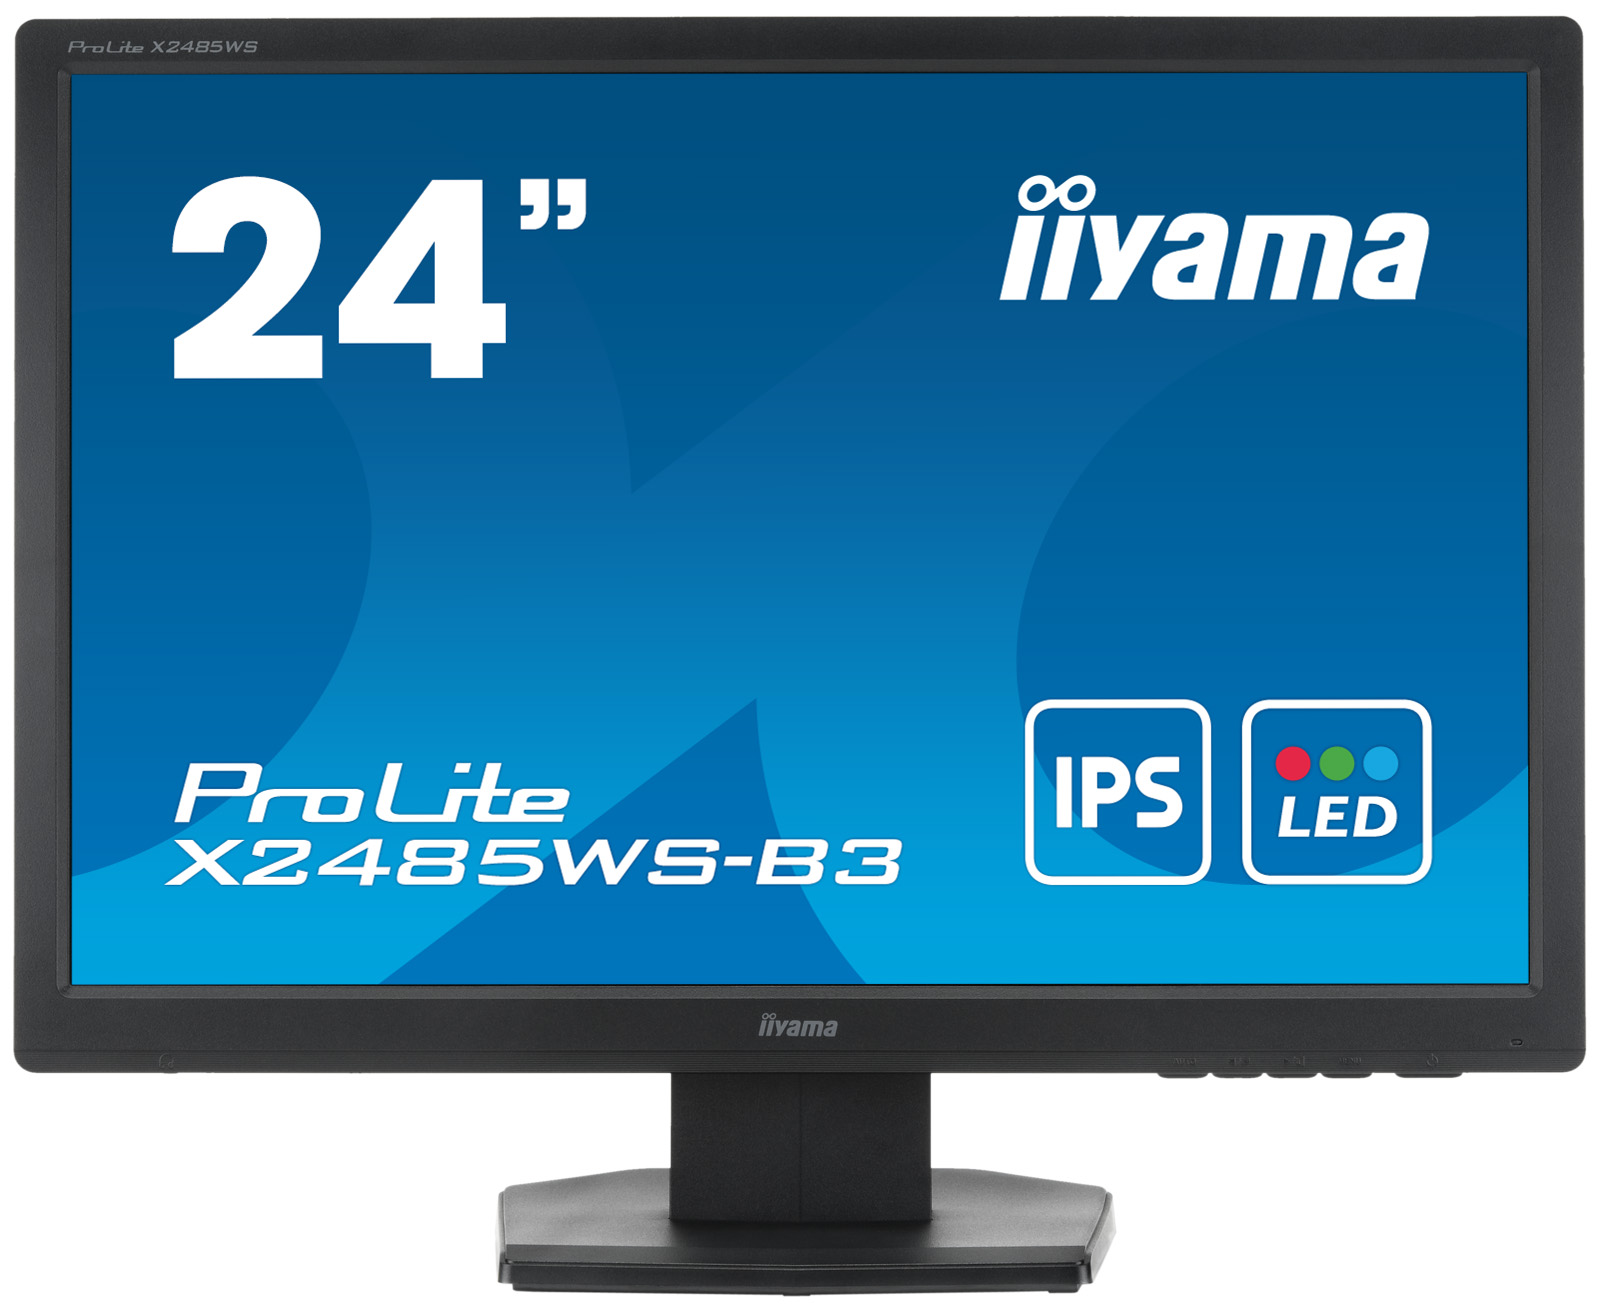 "24"" LCD iiyama X2485WS-B3 -IPS,16:10,4ms,250cd,VGA,DVI-D,DP,repro"